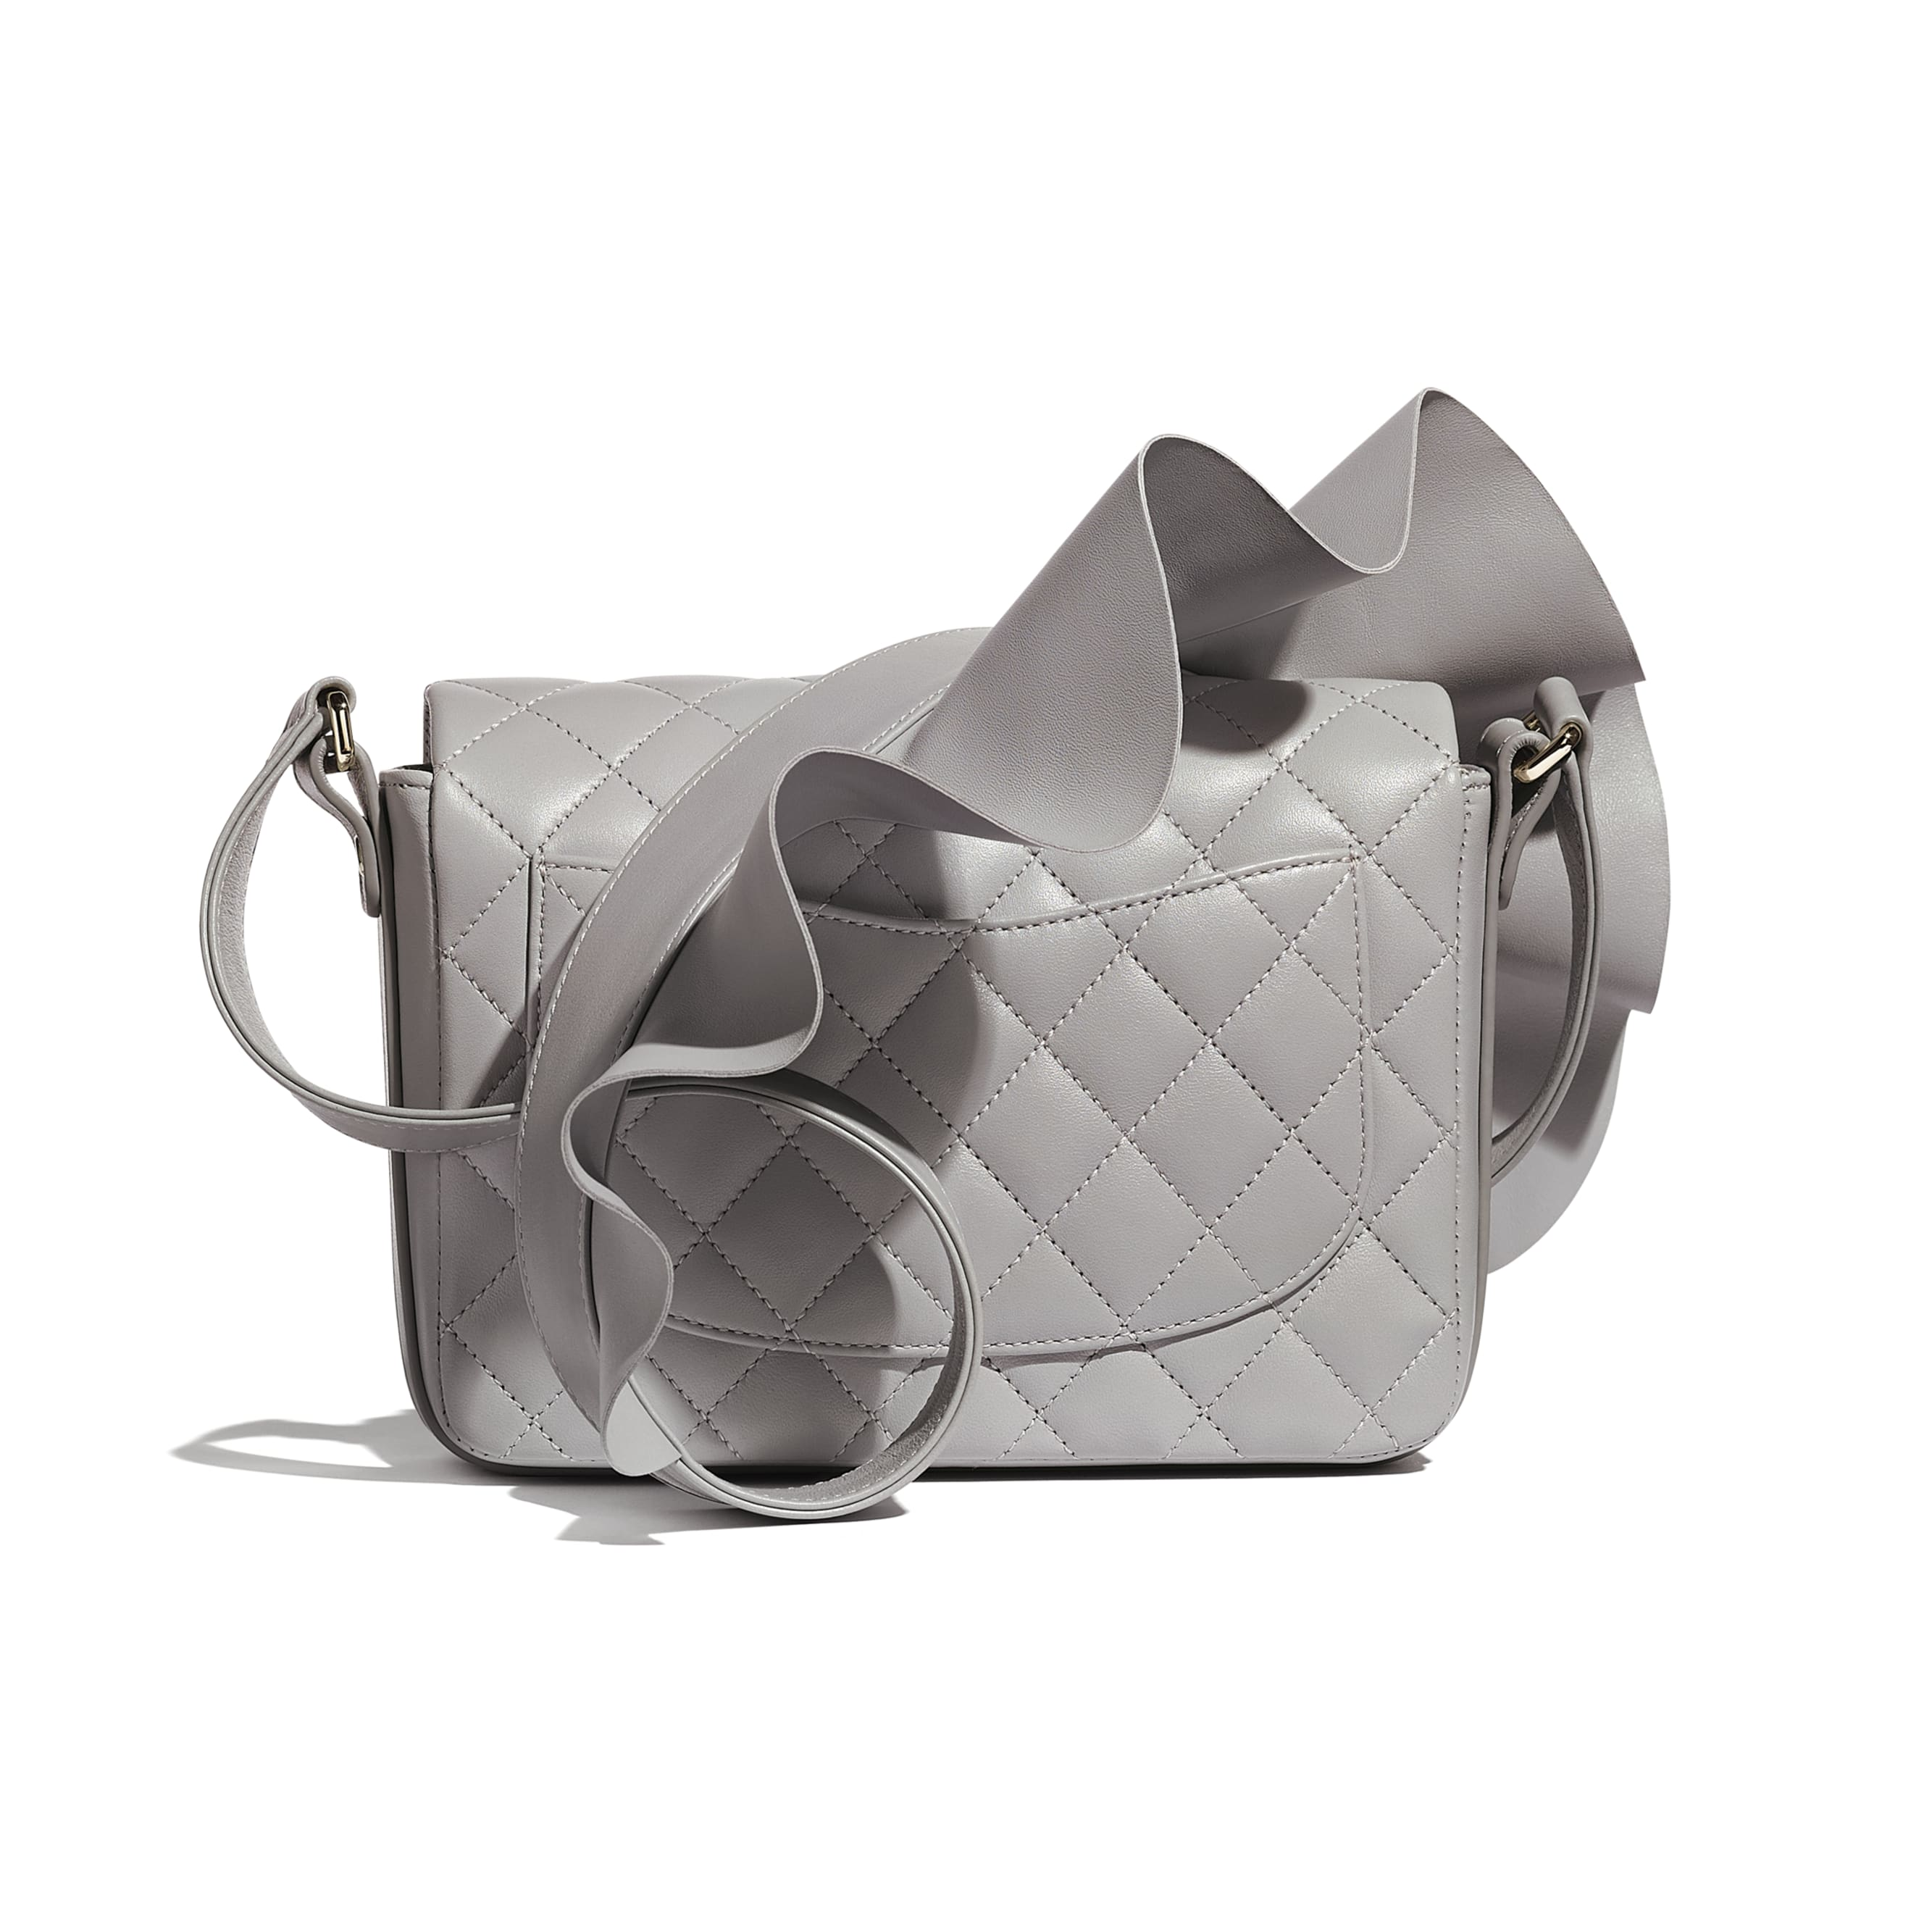 Flap Bag - Light Grey - Lambskin, Calfskin & Gold-Tone Metal - CHANEL - Alternative view - see standard sized version